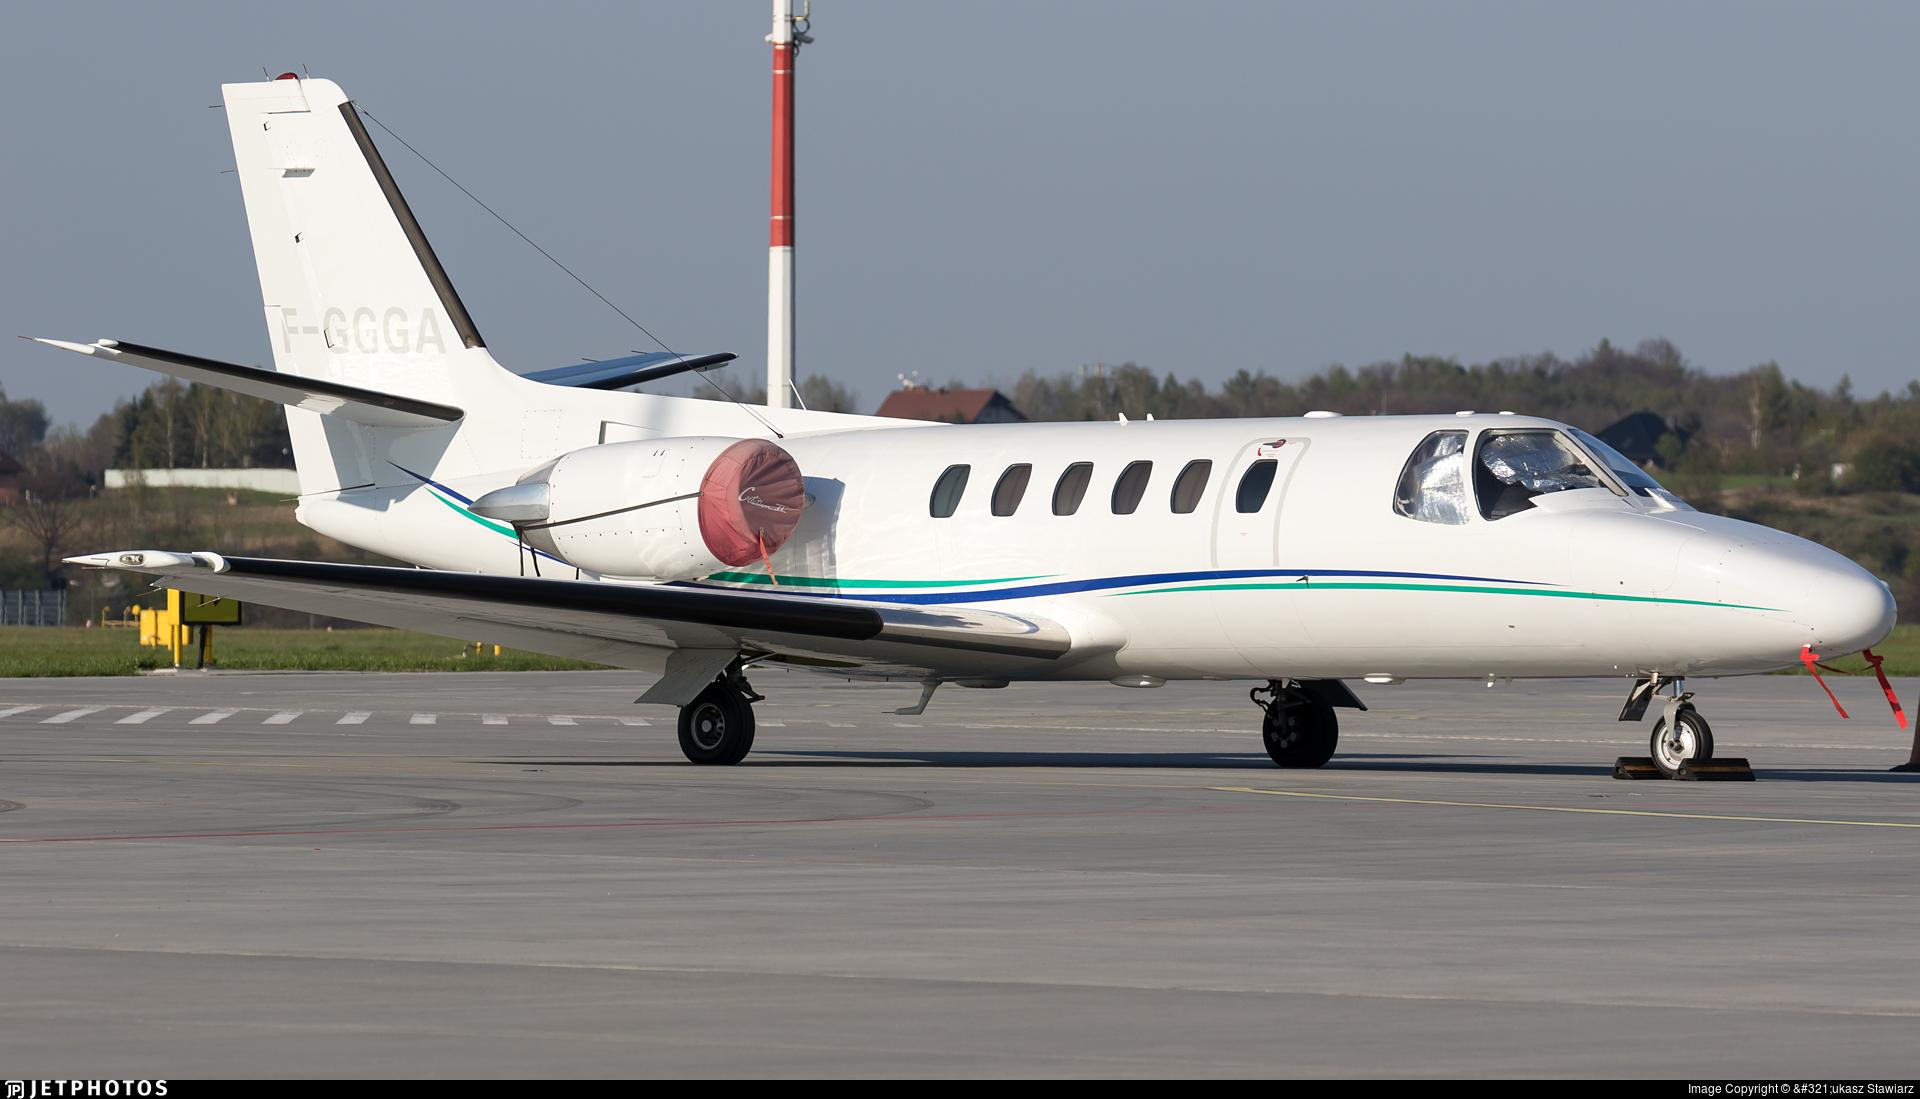 F-GGGA - Cessna 550 Citation II - Aerovision